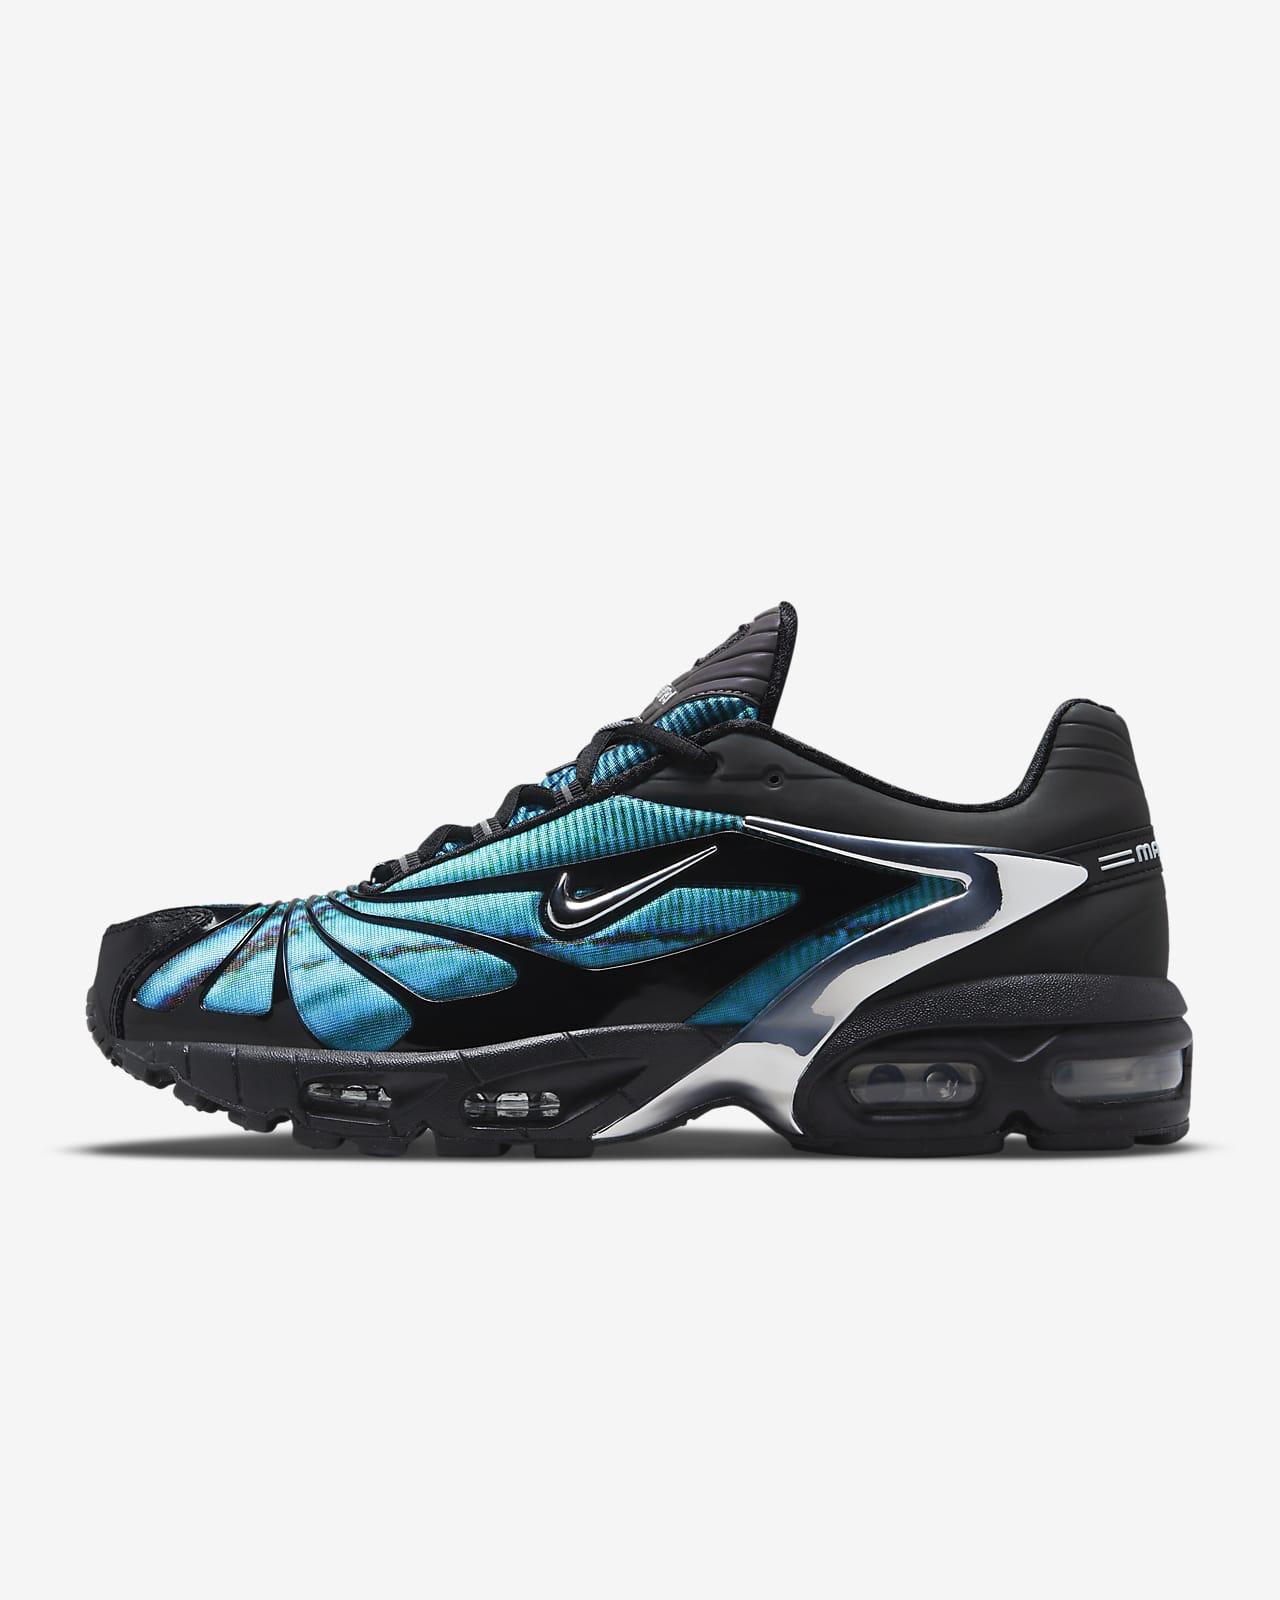 Nike x Skepta Air Max Tailwind V Men's Shoes